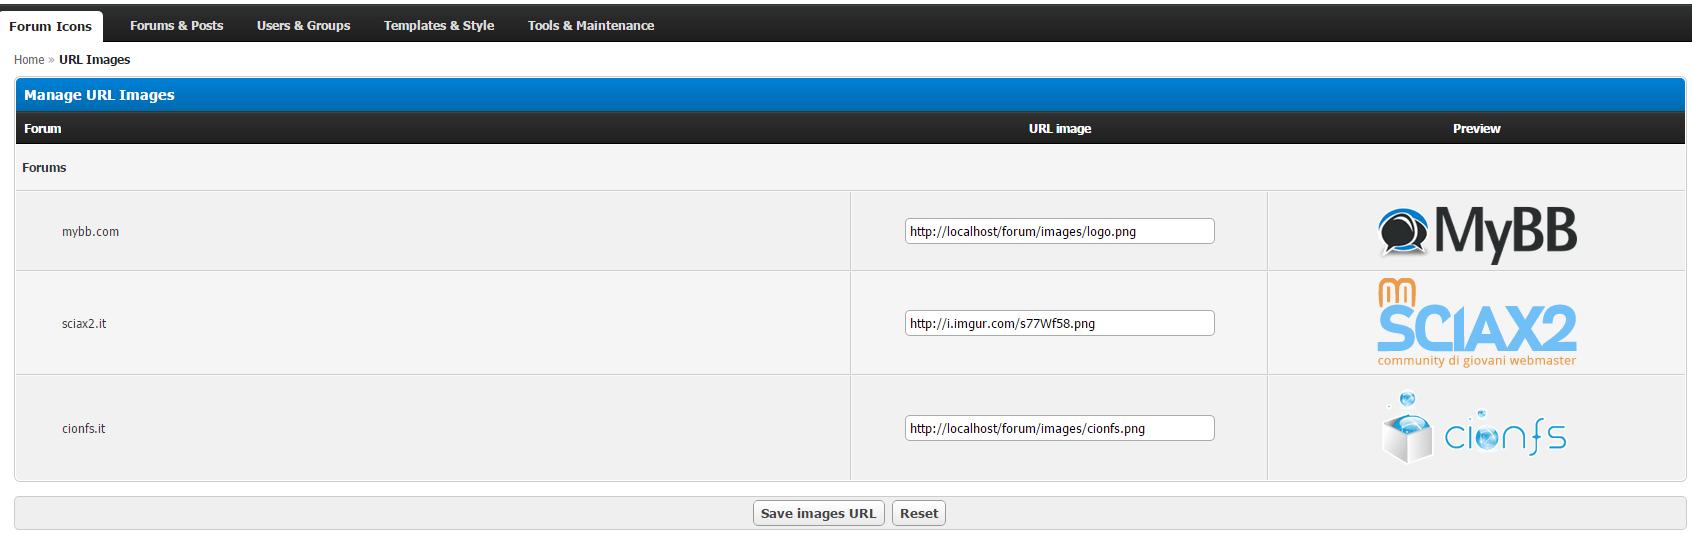 Extend MyBB - Forum Icons